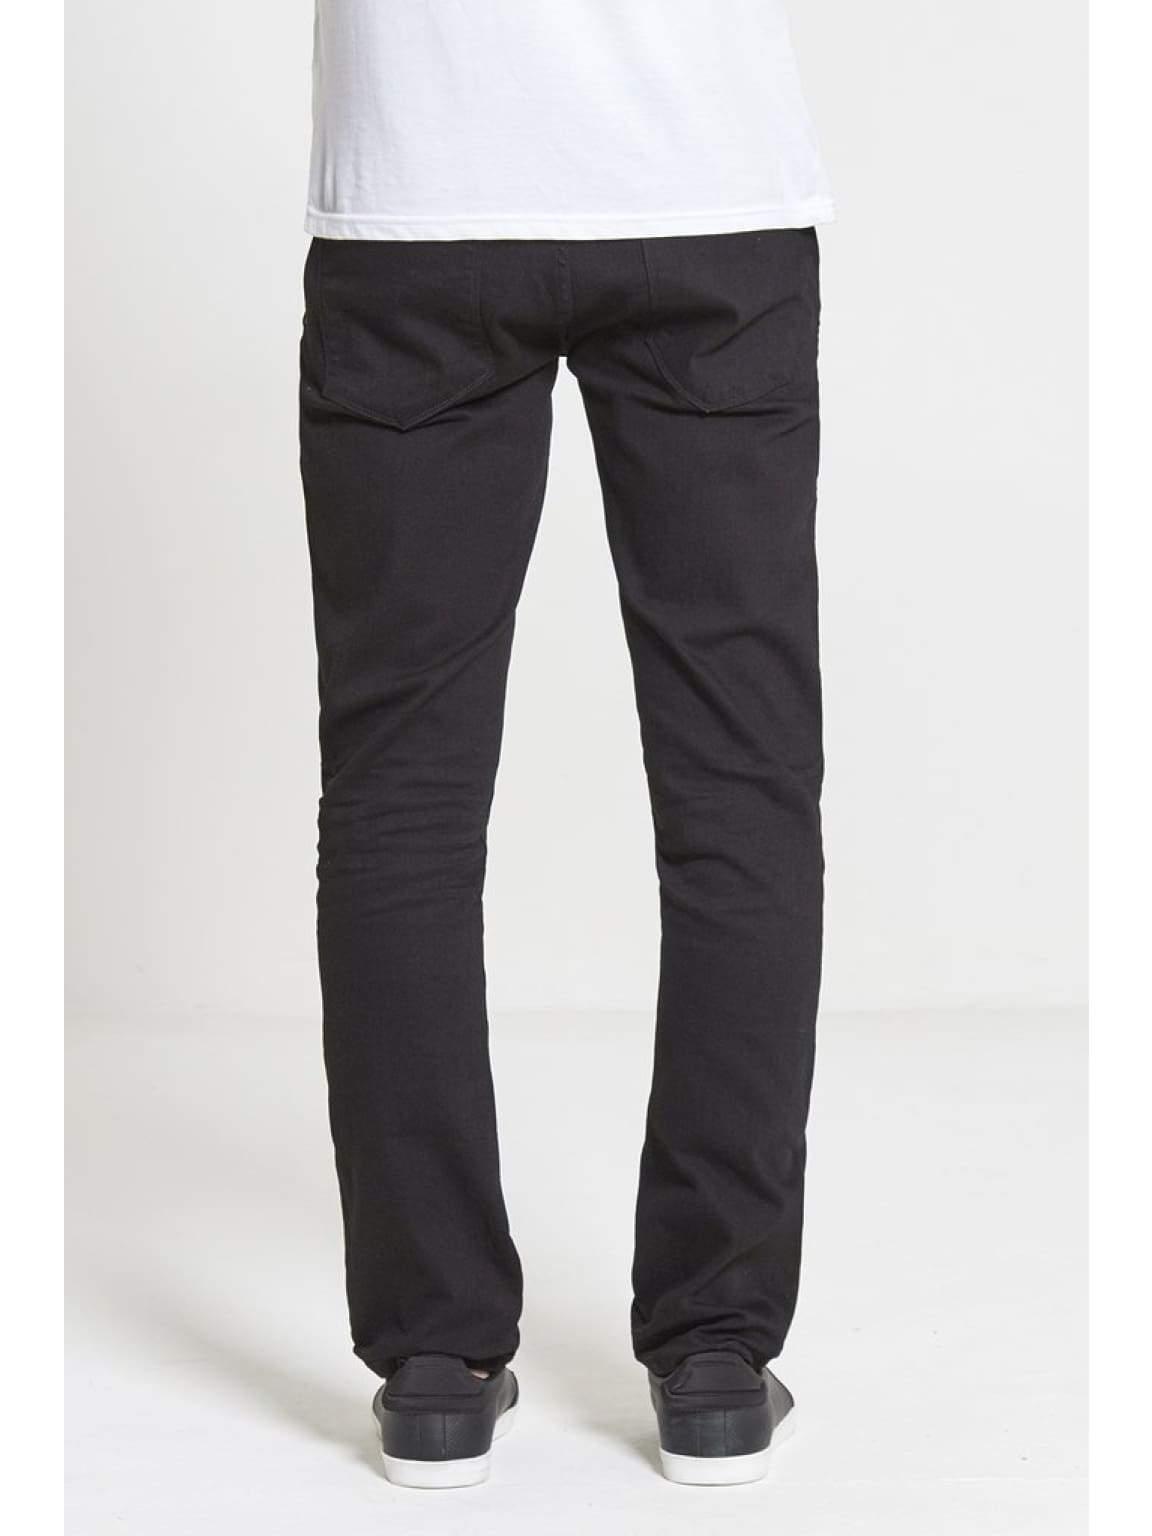 ACE Slim Stretch Jeans In True Black - Jeans